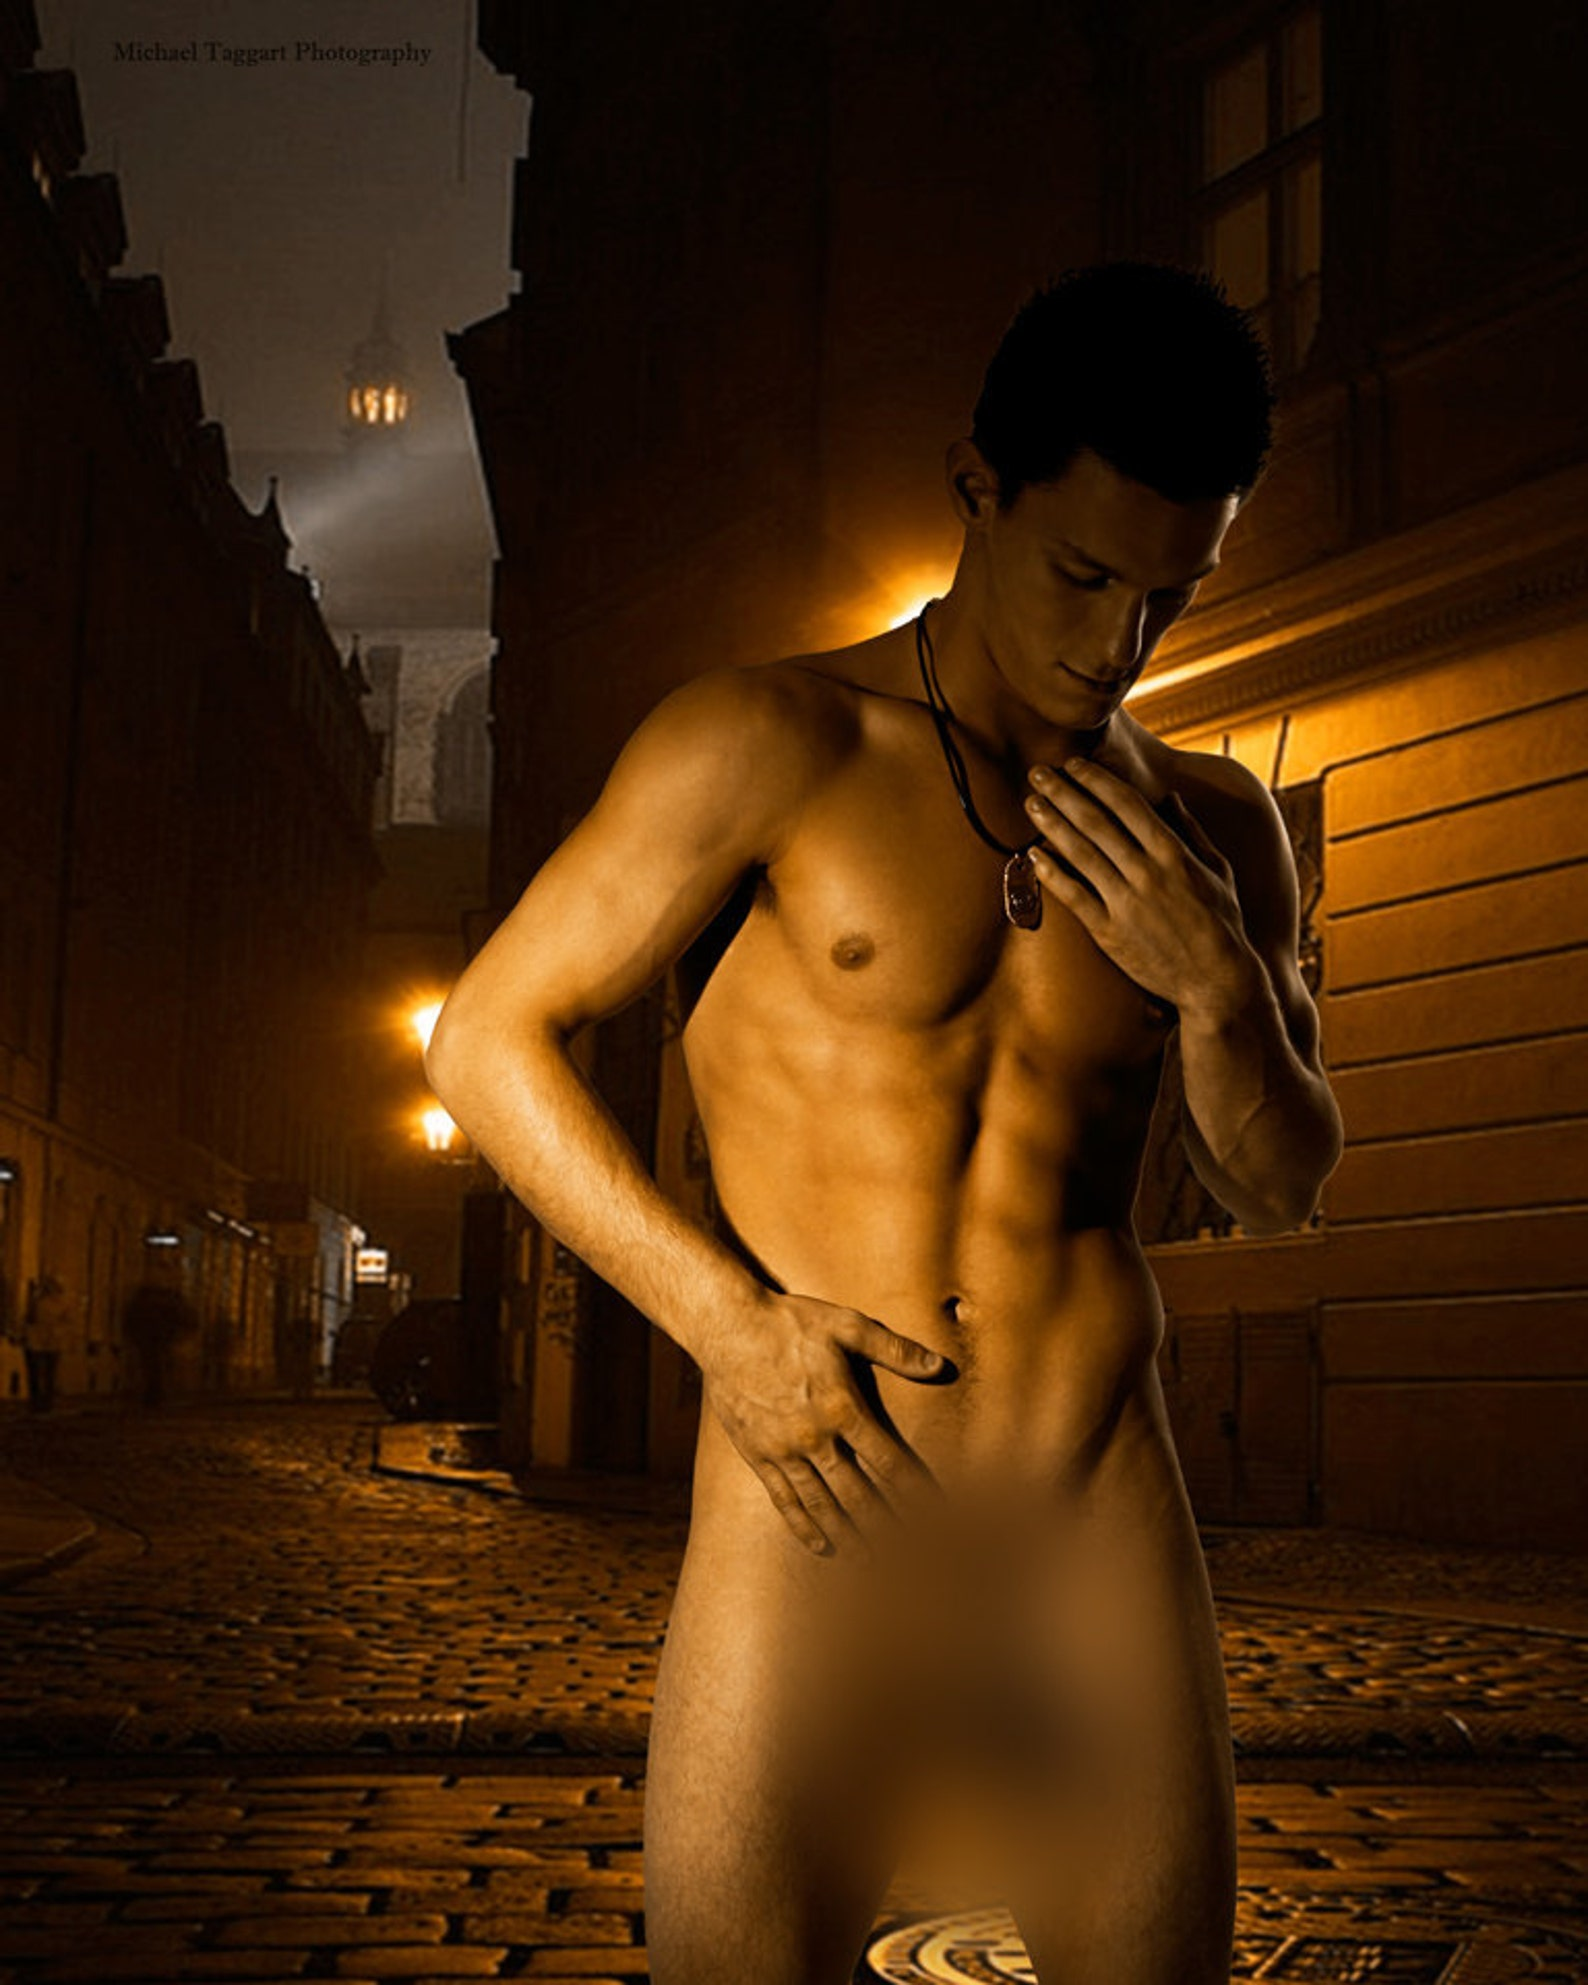 Toronto Police Officer Strips Naked Hundreds Of People